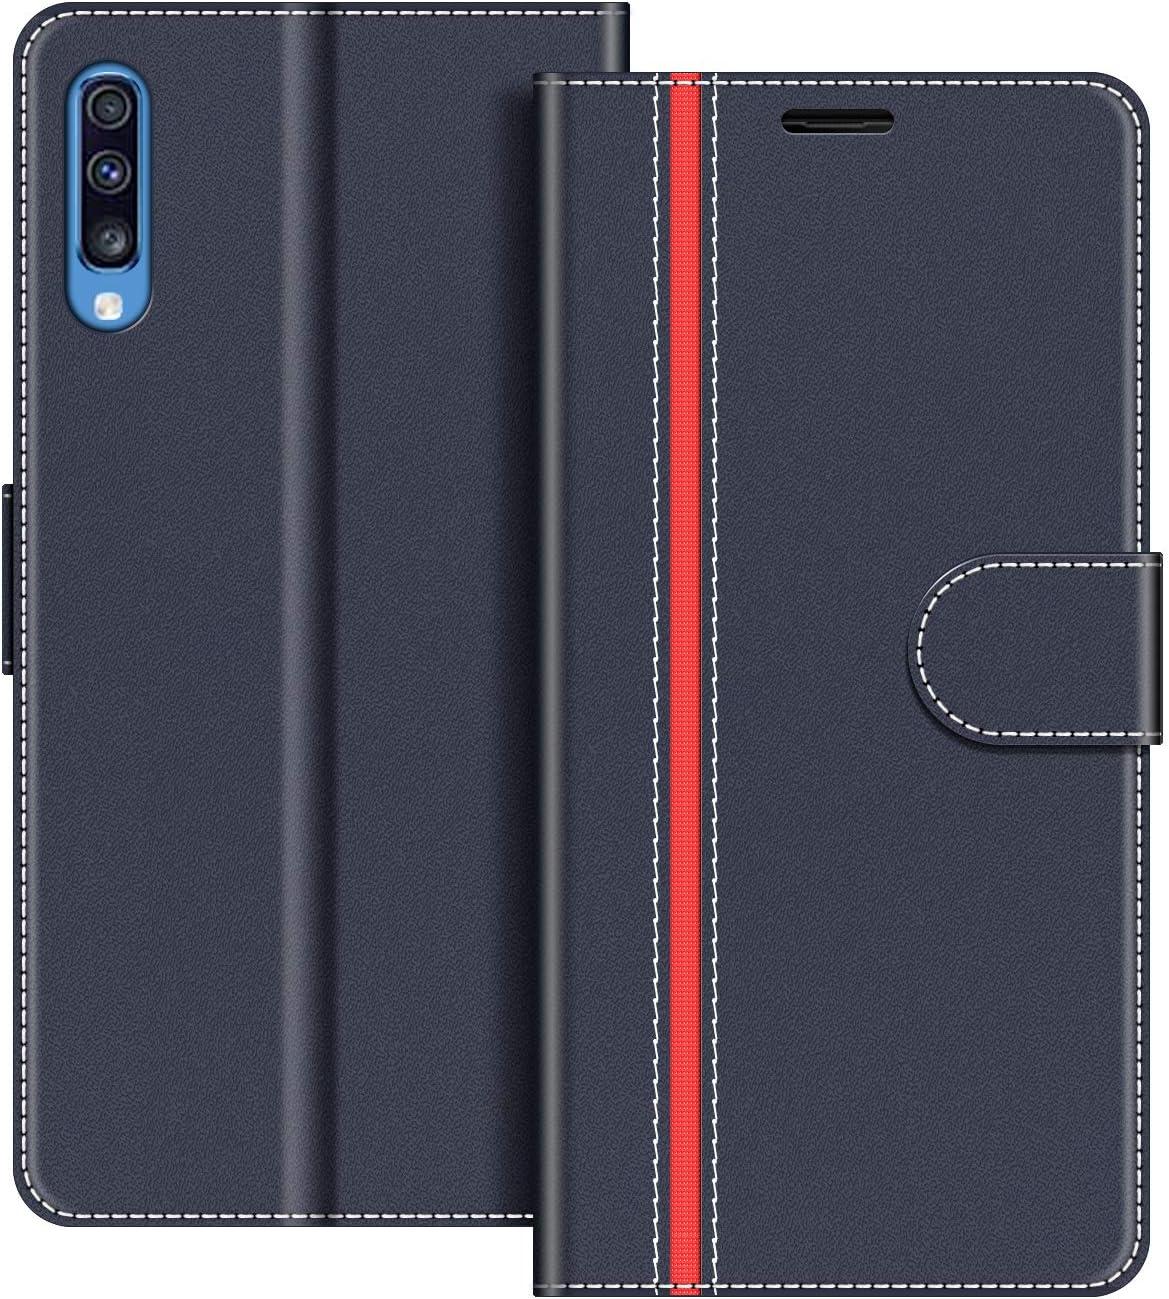 COODIO Funda Samsung Galaxy A70 con Tapa, Funda Movil Samsung A70, Funda Libro Galaxy A70 Carcasa Magnético Funda para Samsung Galaxy A70, Azul Oscuro/Rojo